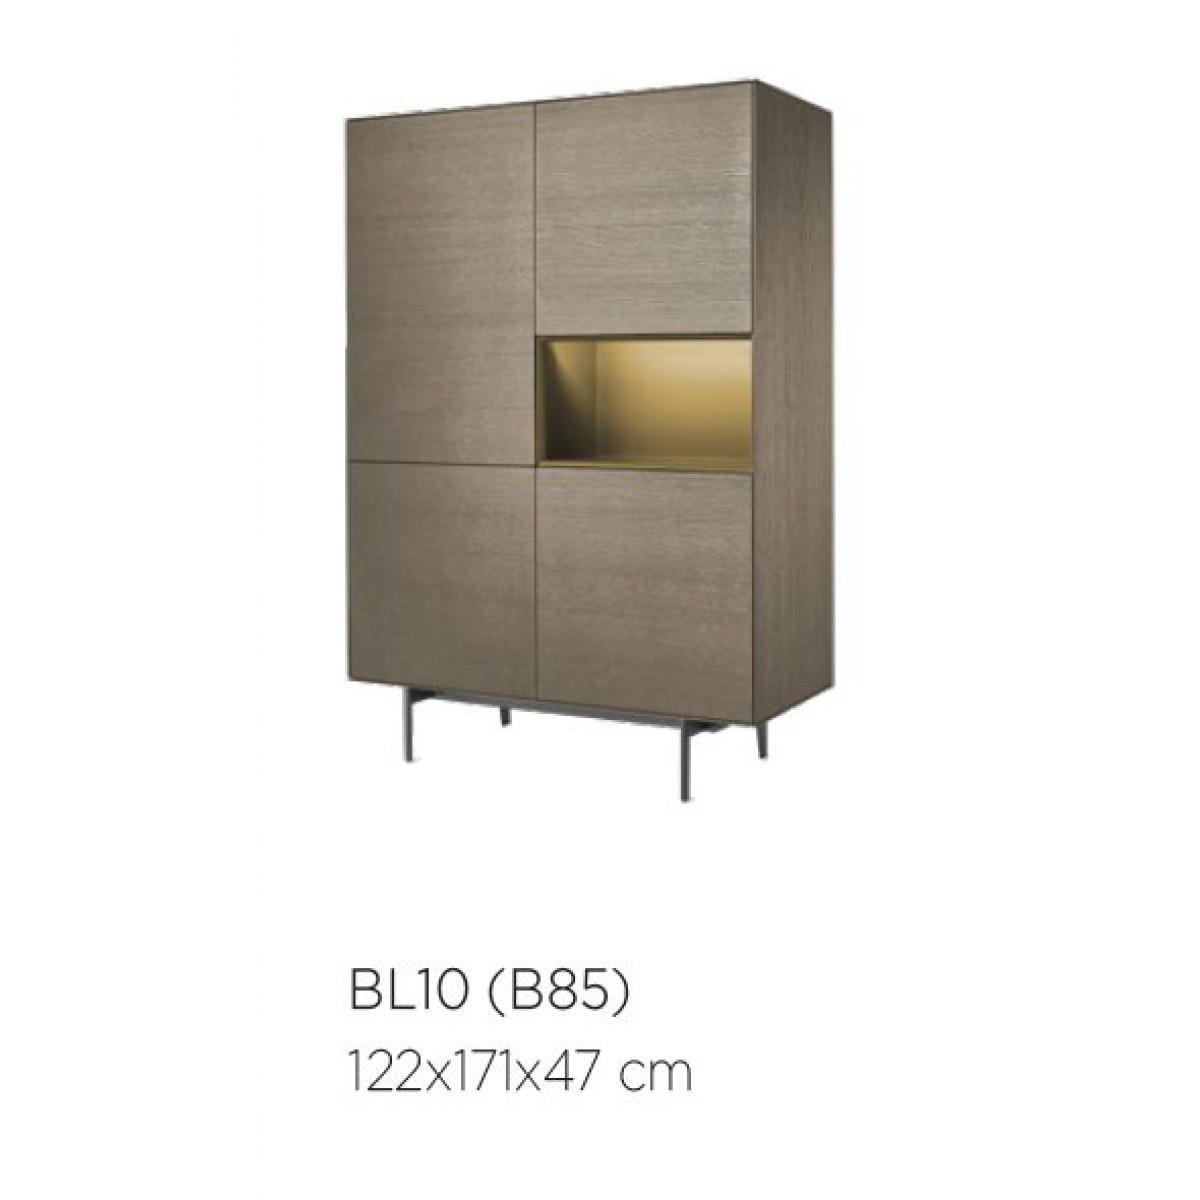 bergkast-buffet-bloom-eiken-BL10-miltonhouse-plint-hangend-metalen-pootstel